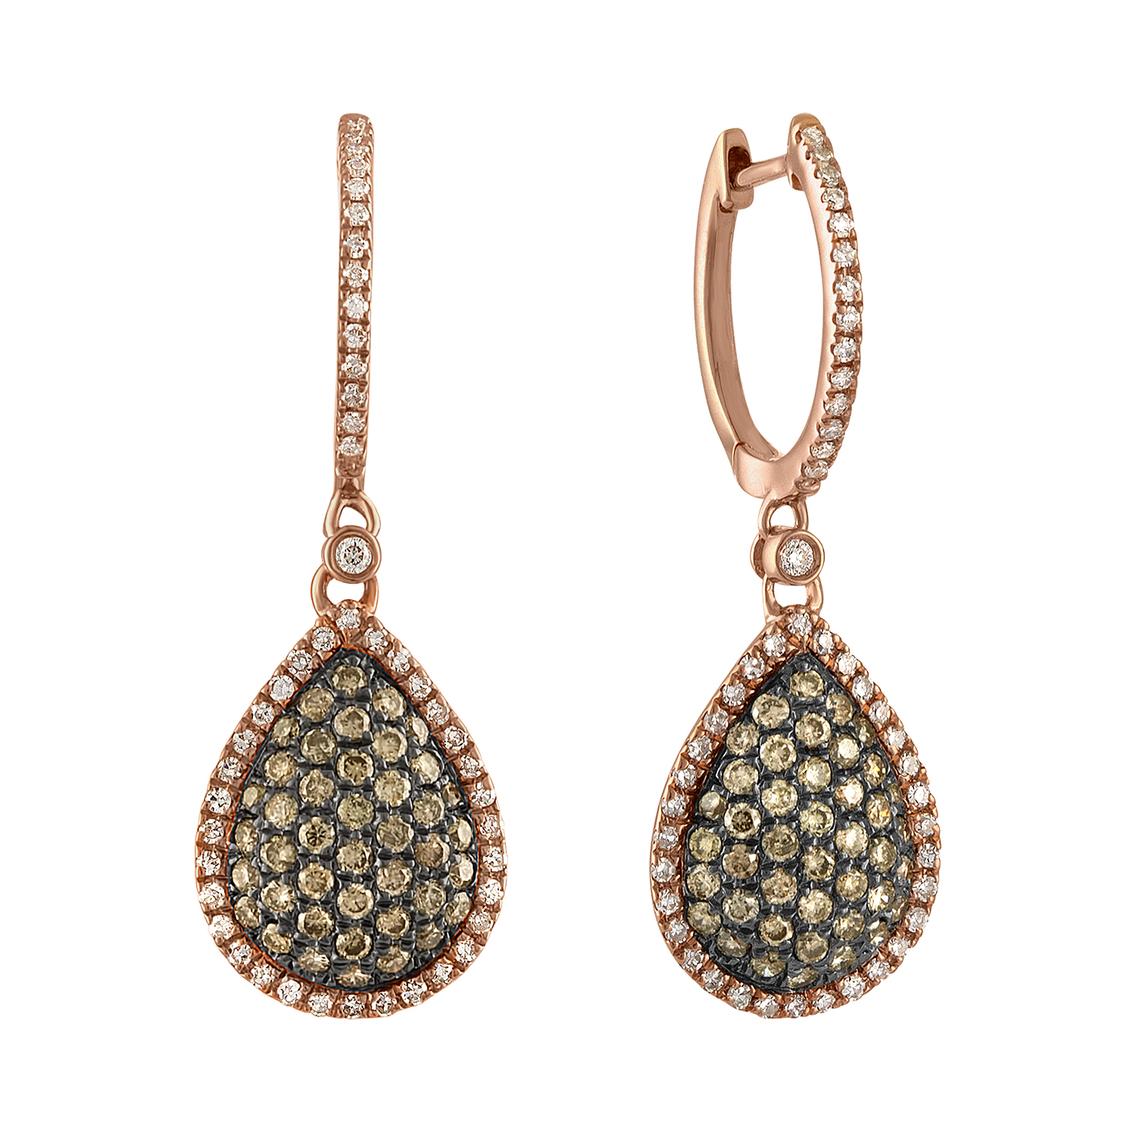 Prism USA Inc - Jewelry / Photography